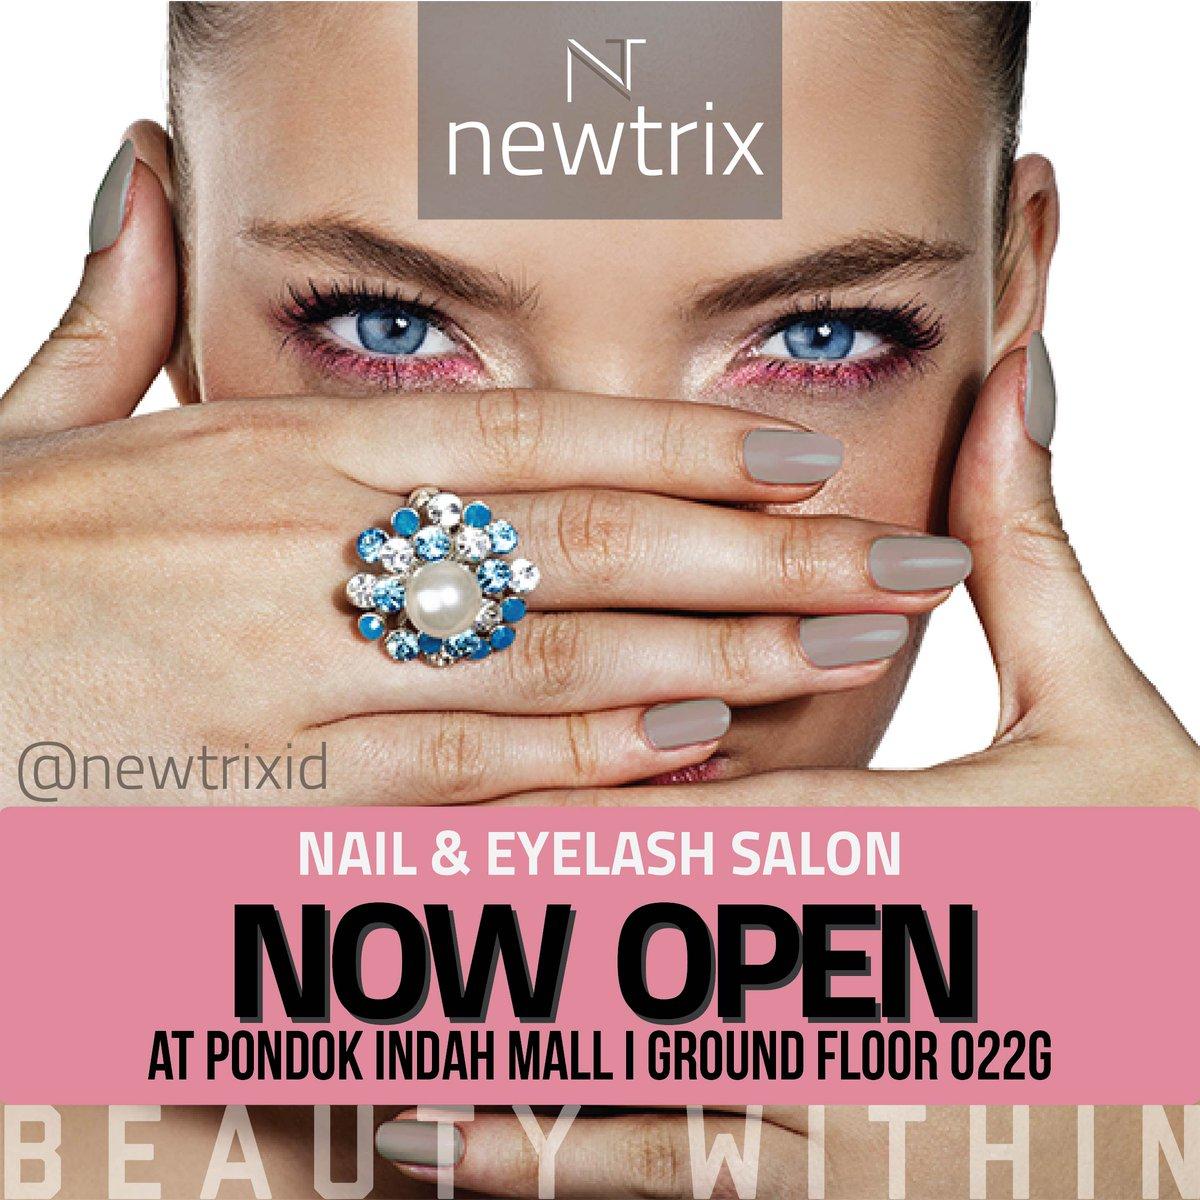 "Pondok Indah Mall On Twitter: ""NEWTRIX Nail & Eyelash"